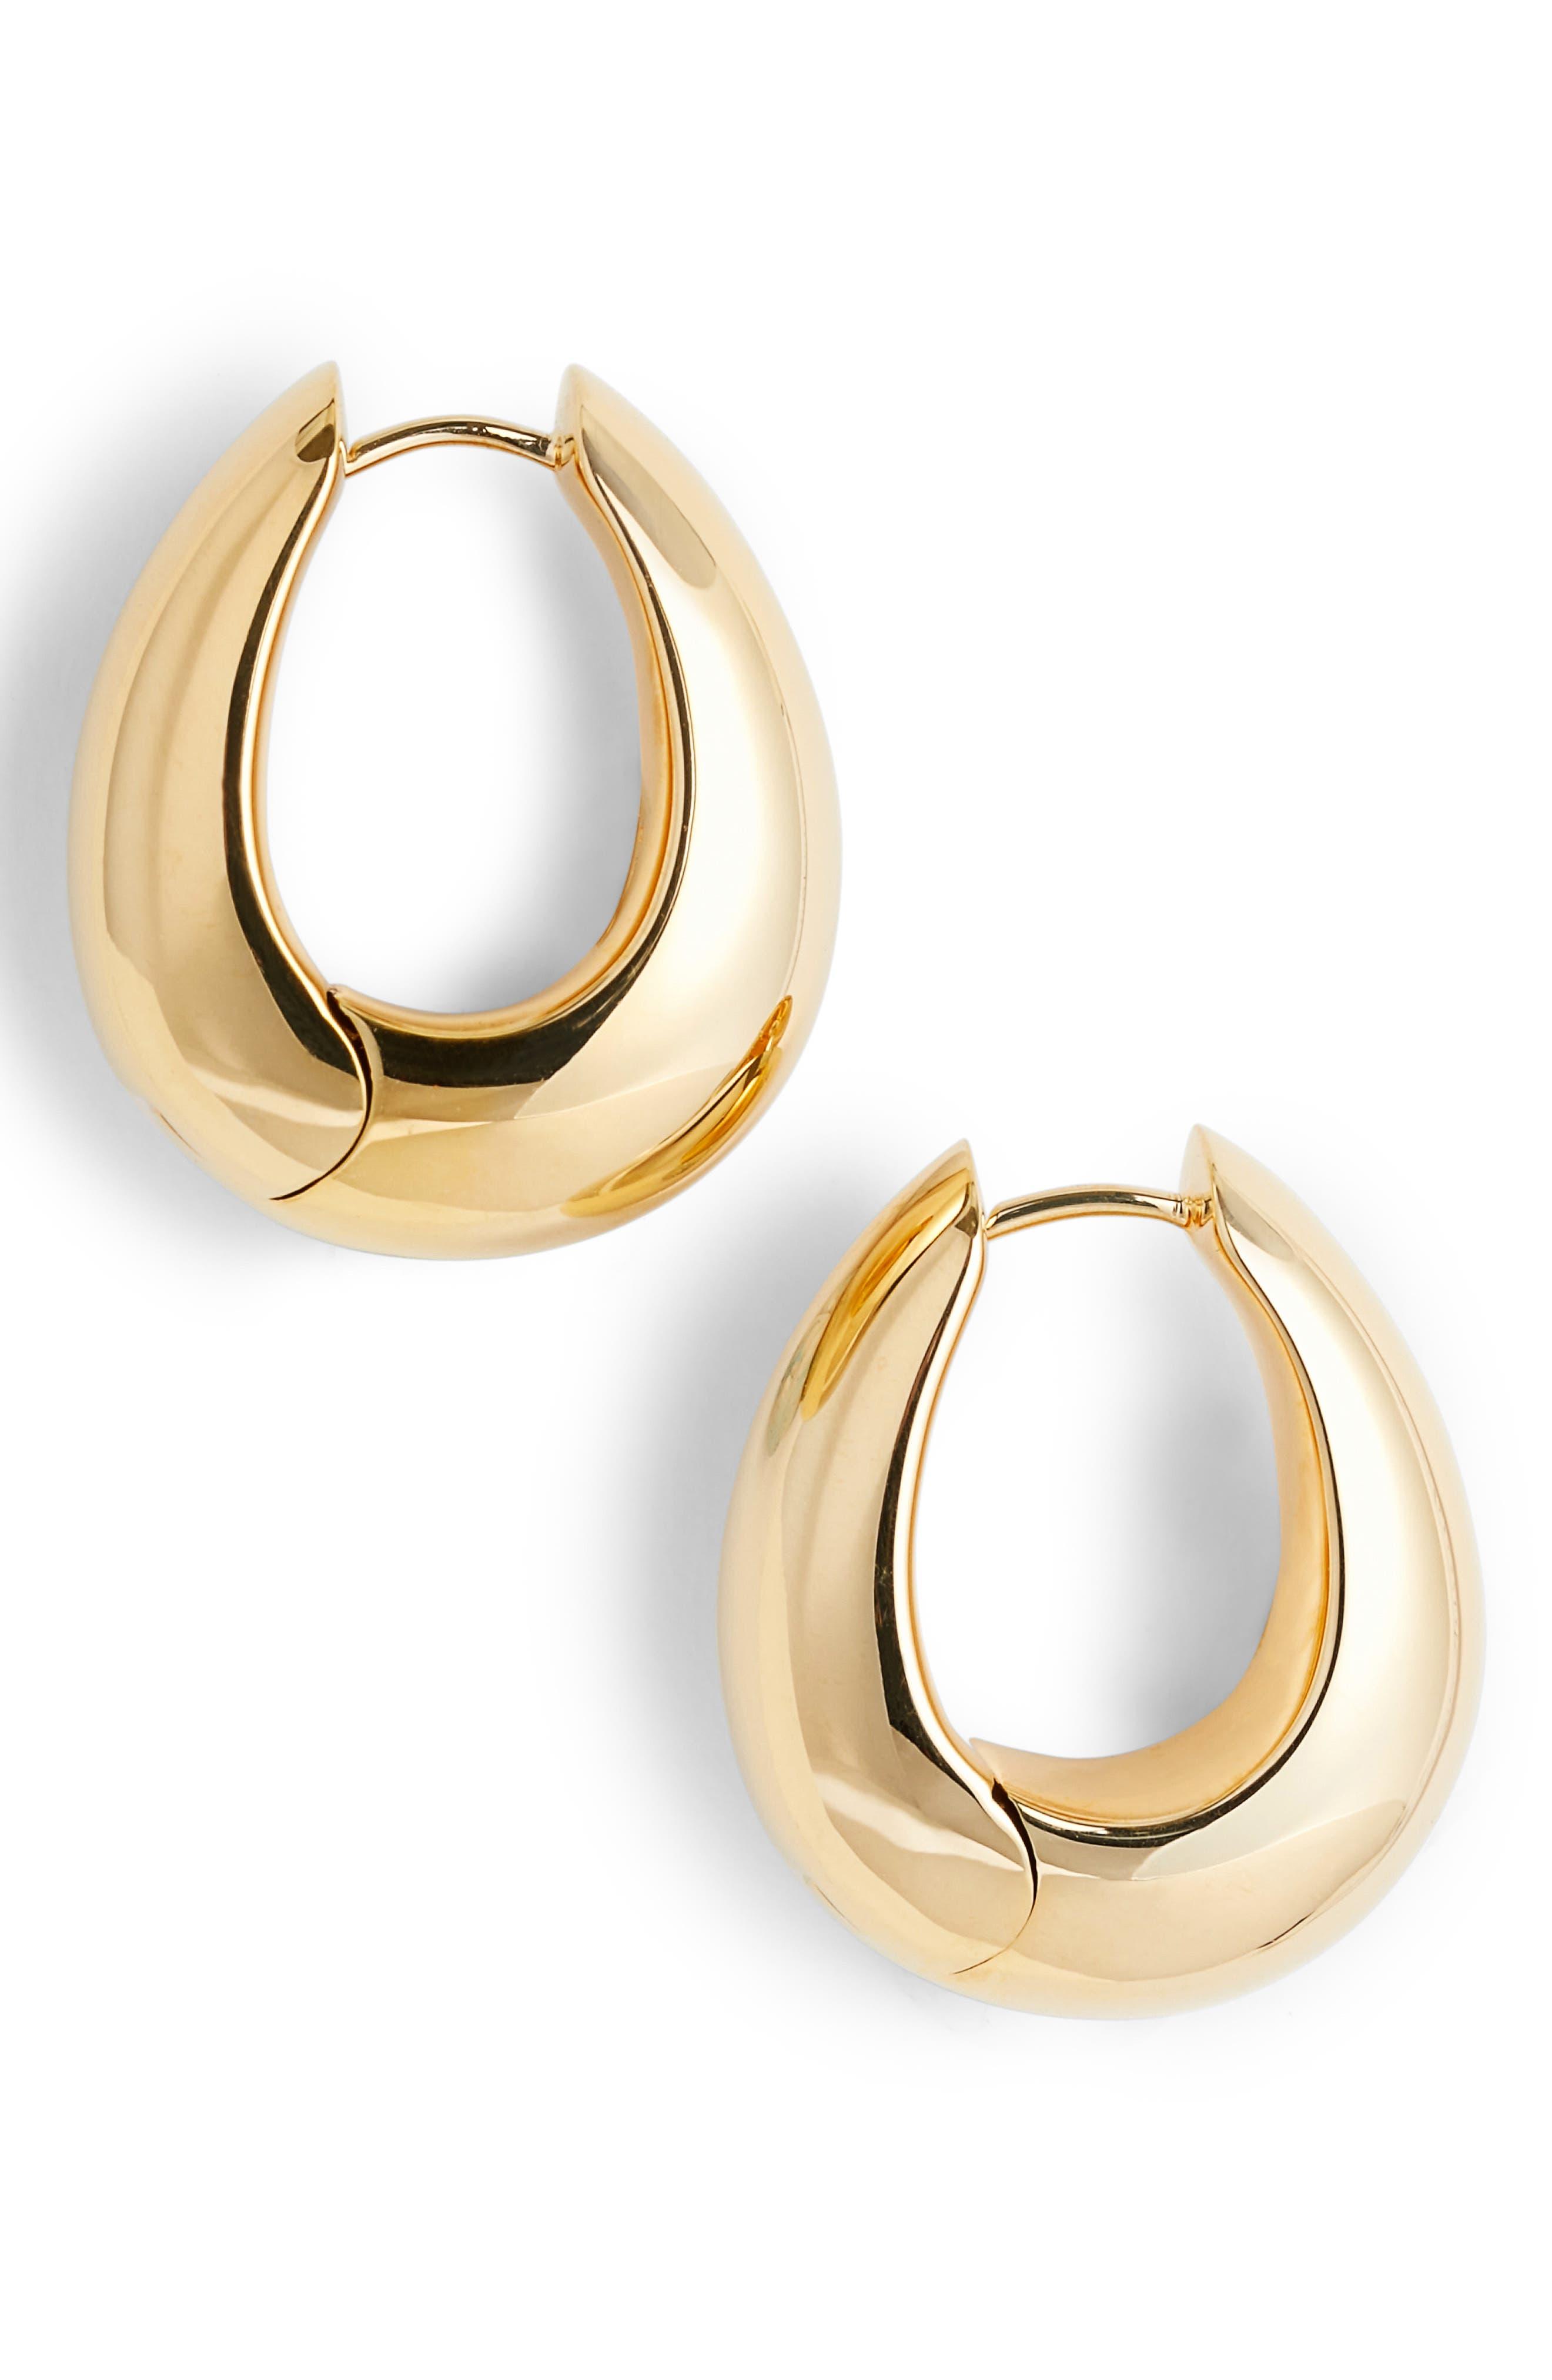 Large Ice Hoop Earrings,                         Main,                         color, 925 SILVER/9K GOLD